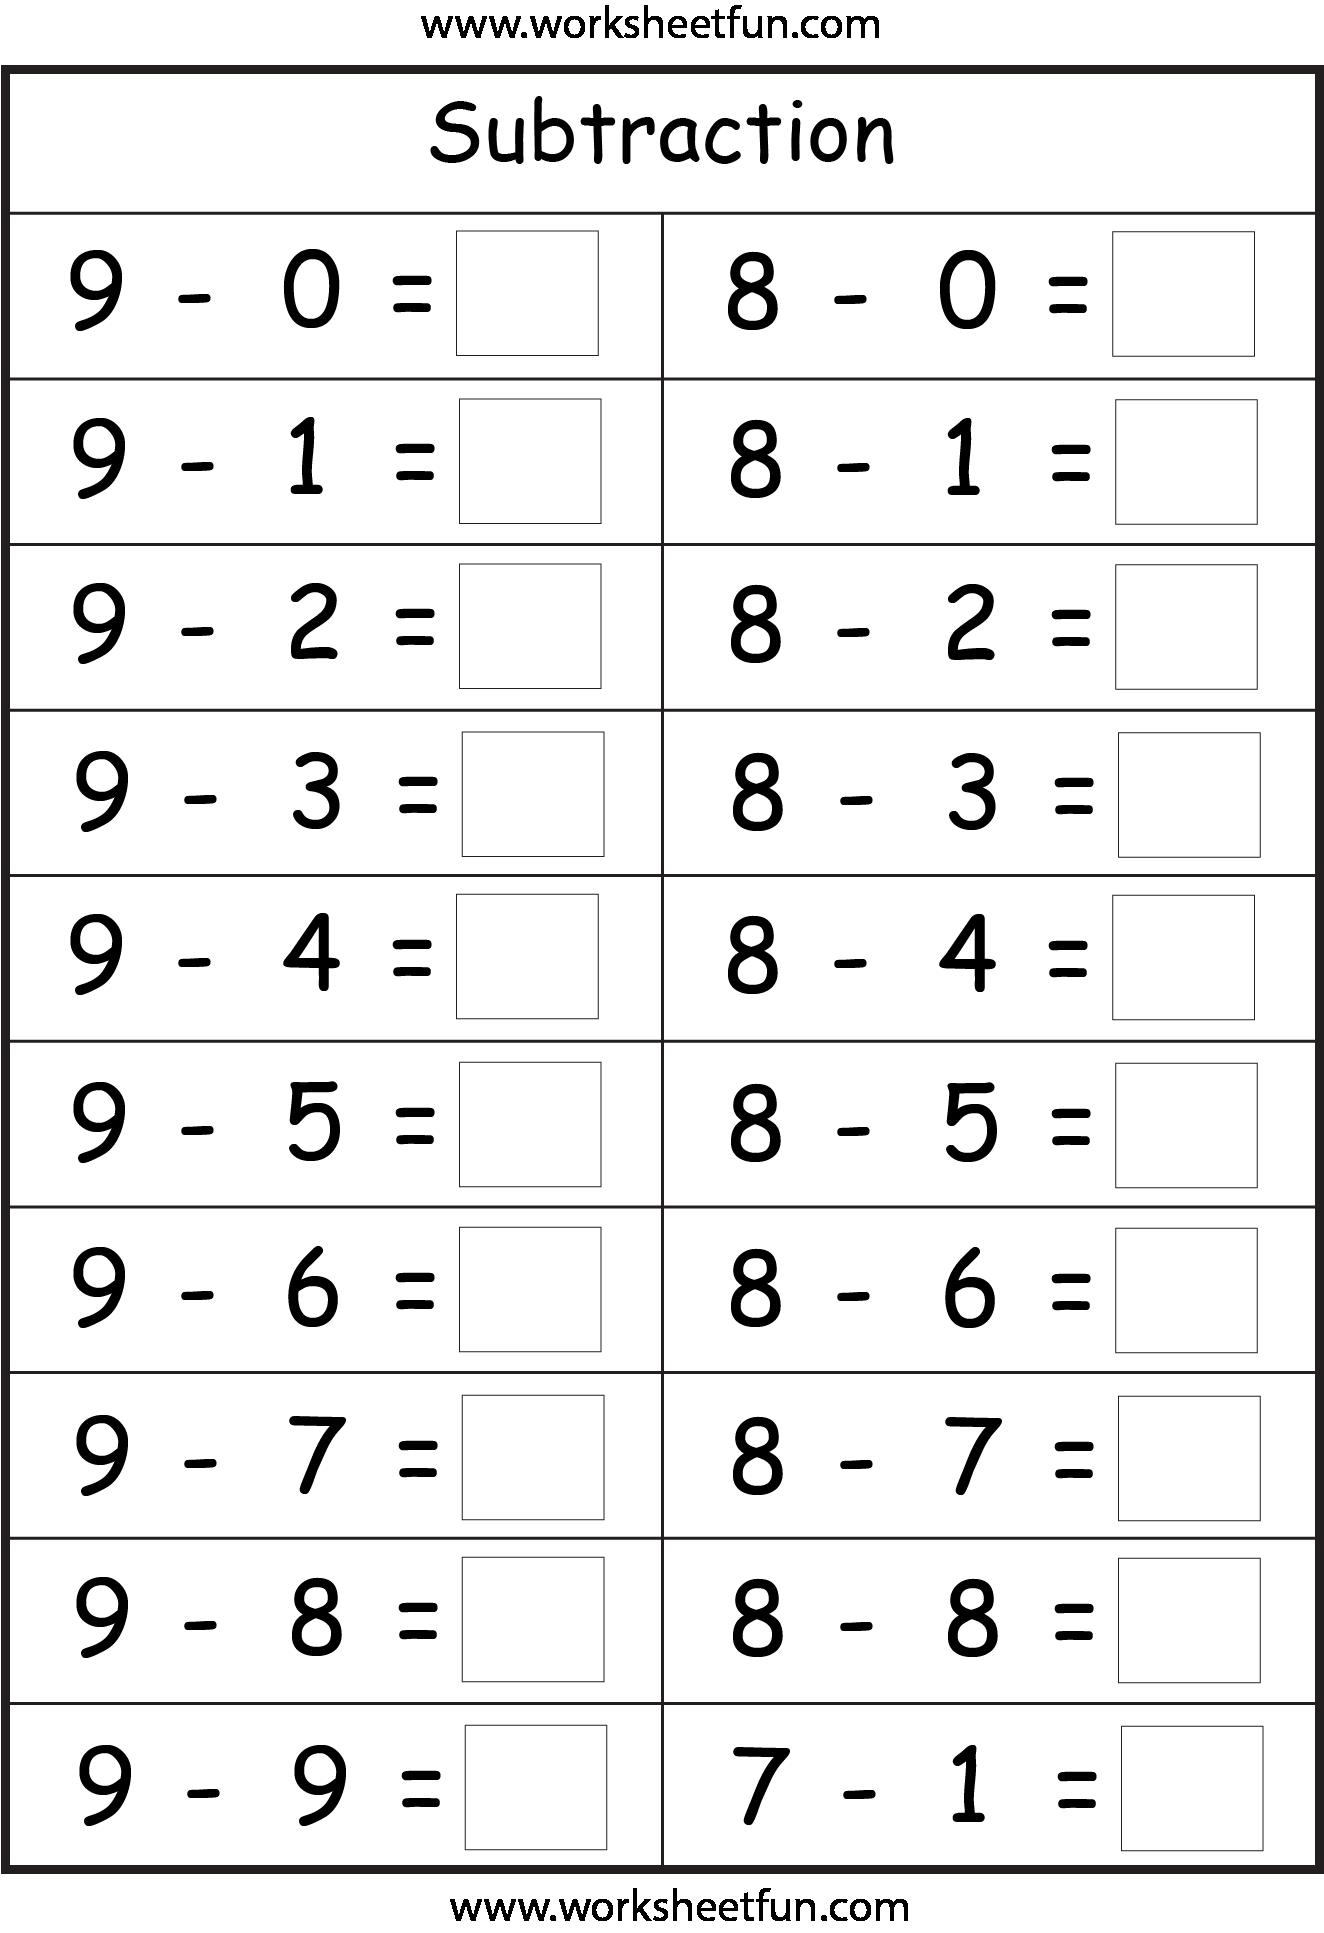 Subtraction - 4 Worksheets | Printable Worksheets ...